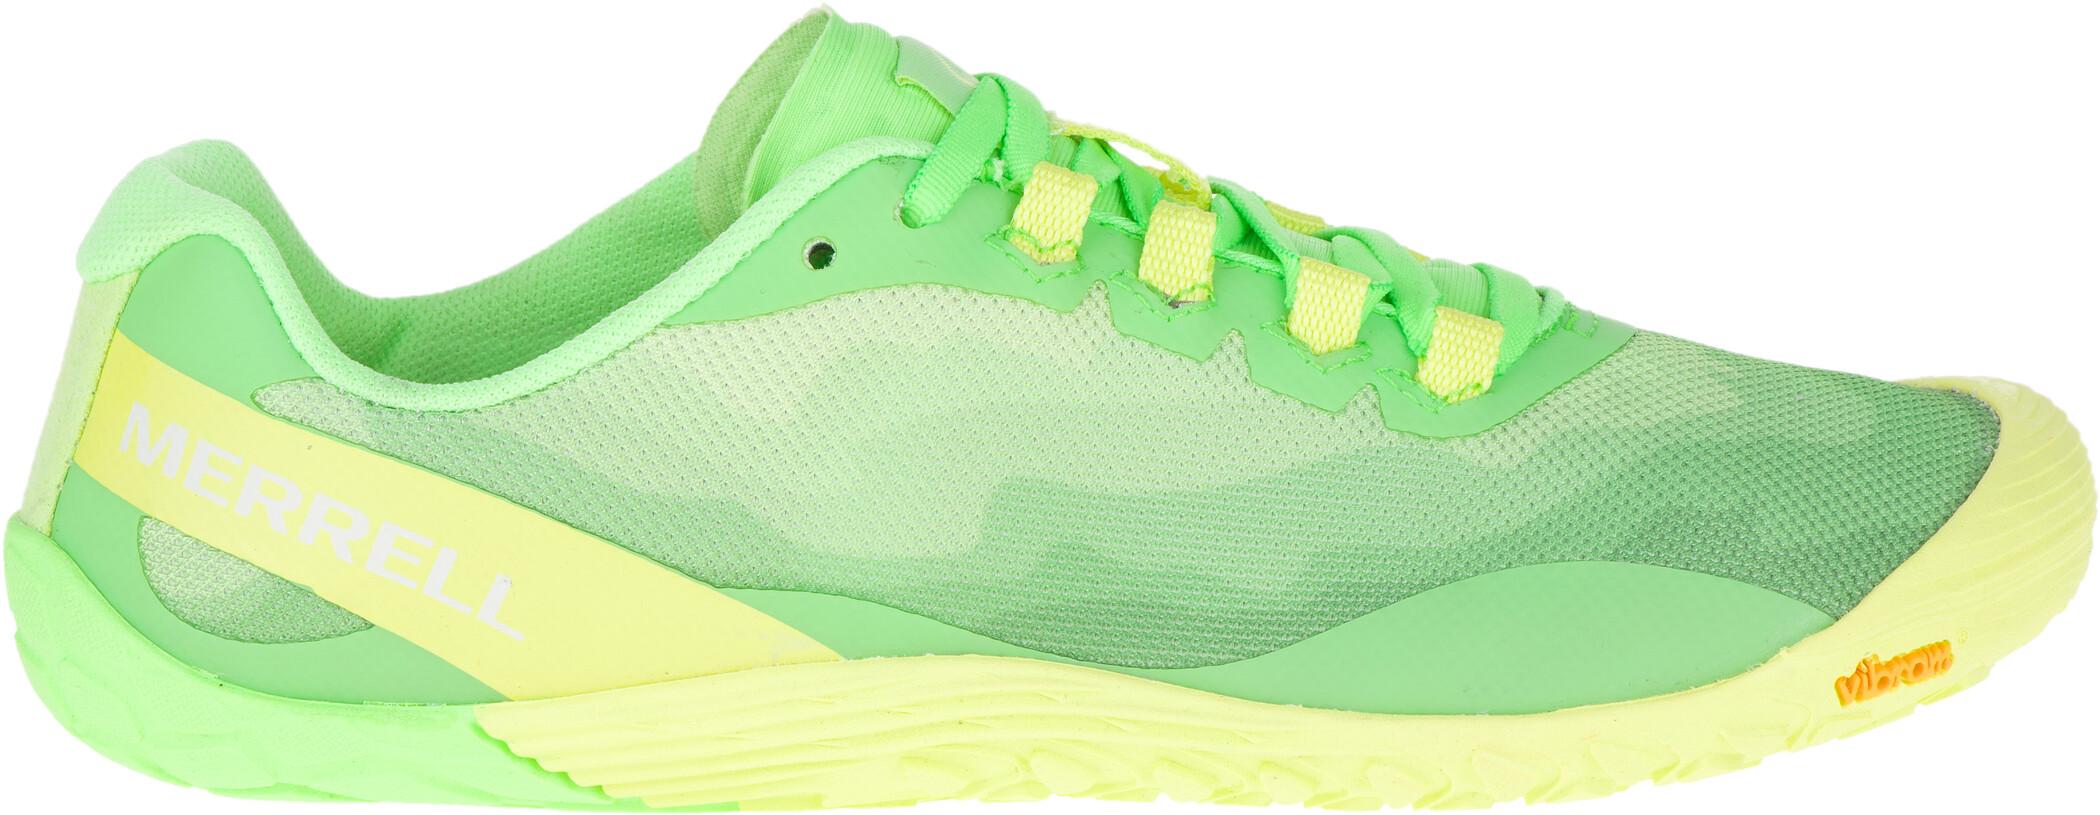 IQ1 adidas CH Rocket Boost MC W Damen Winter Sneaker Schuhe